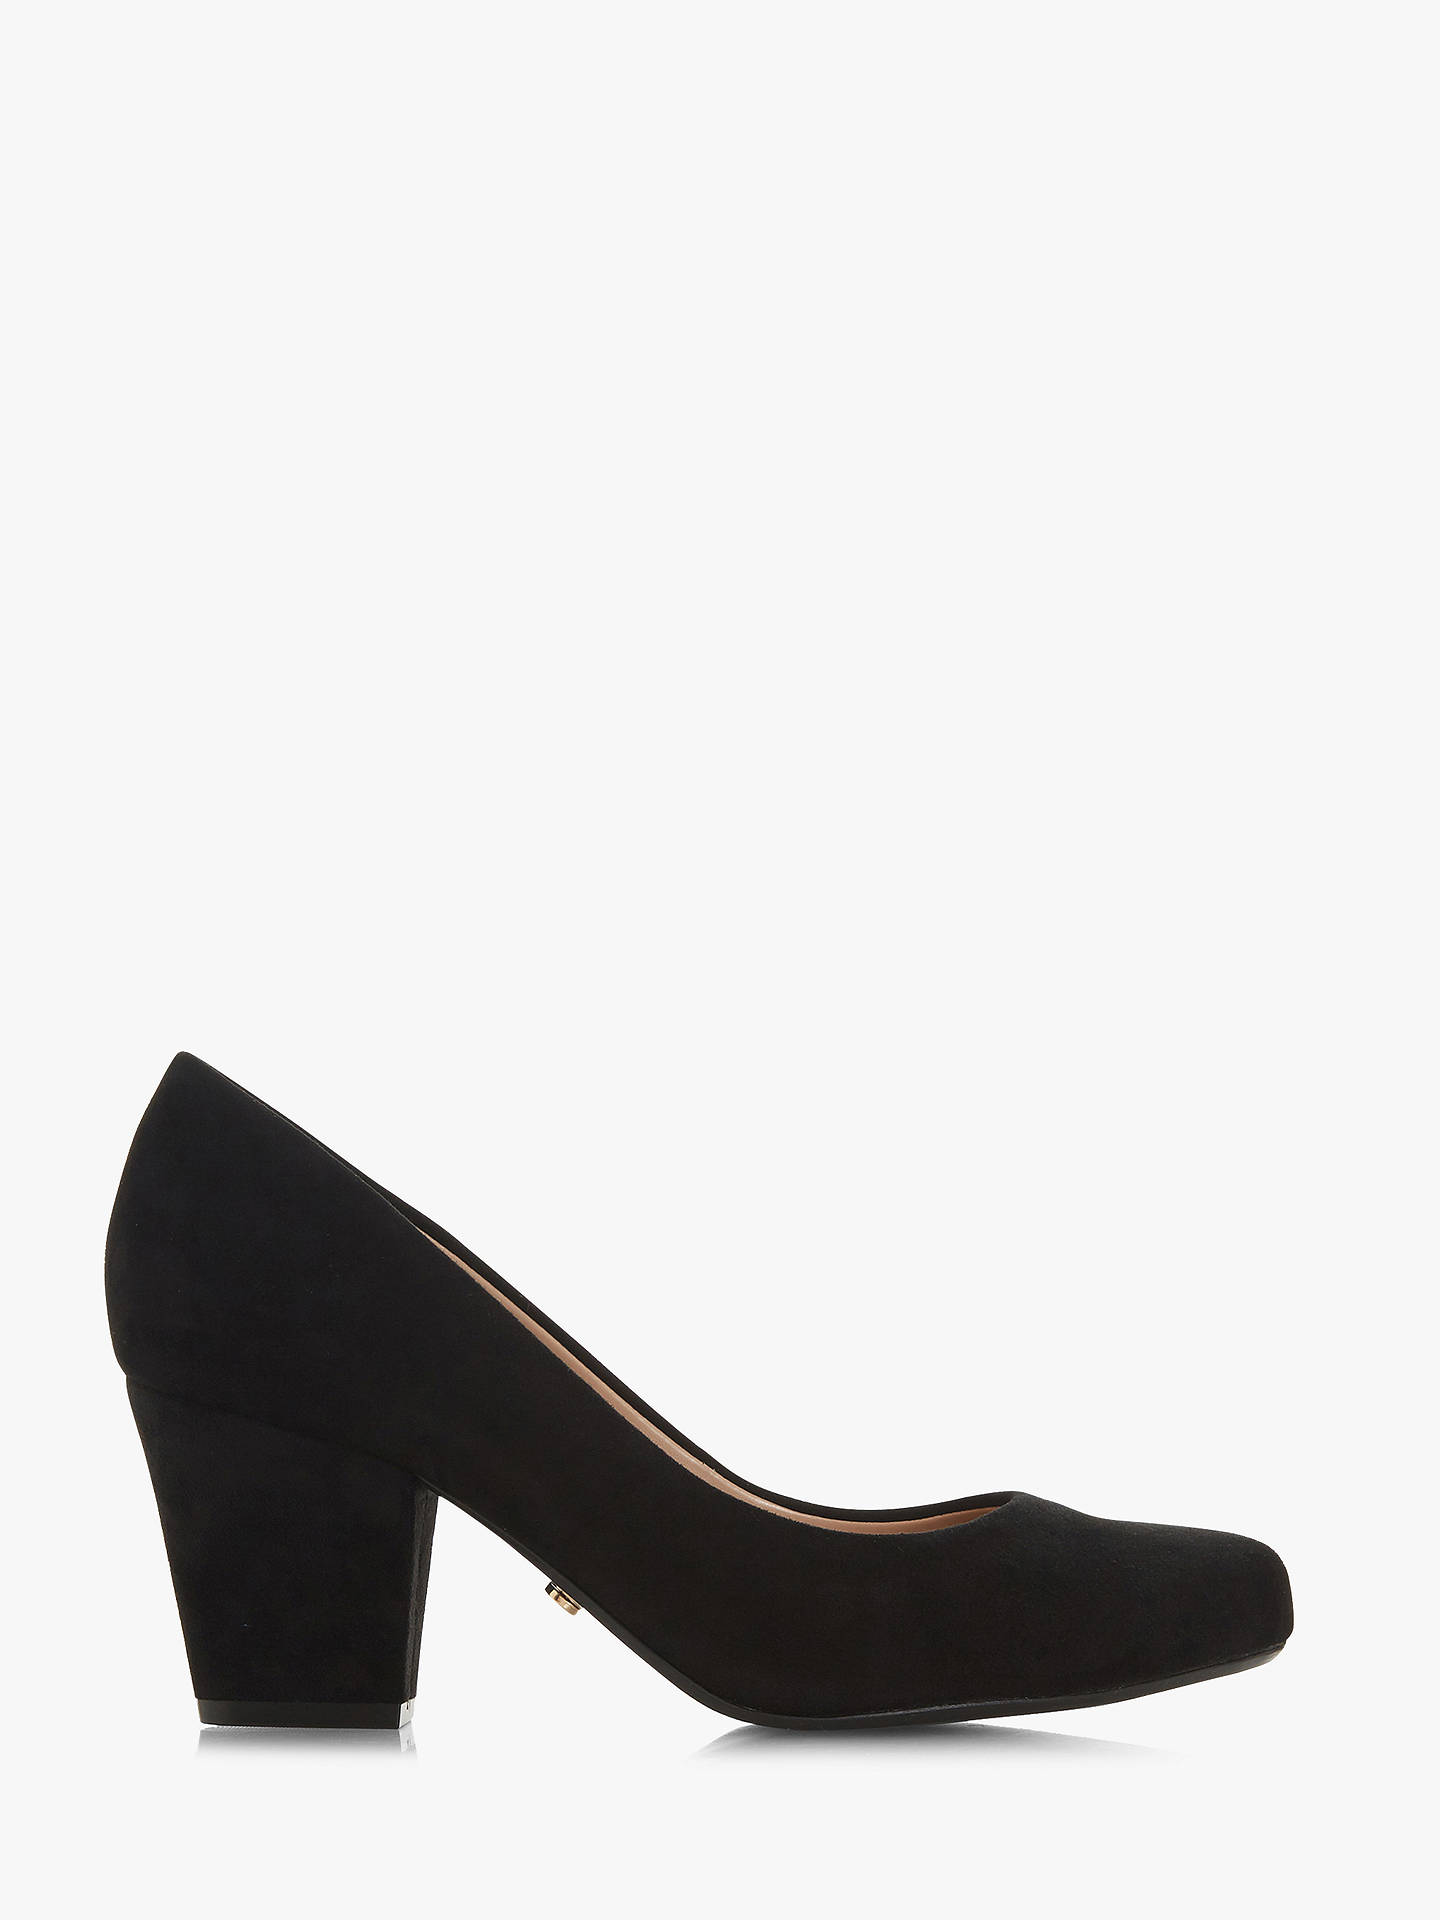 7363cdf1e01 Dune Anthena Block Heel Court Shoes at John Lewis   Partners